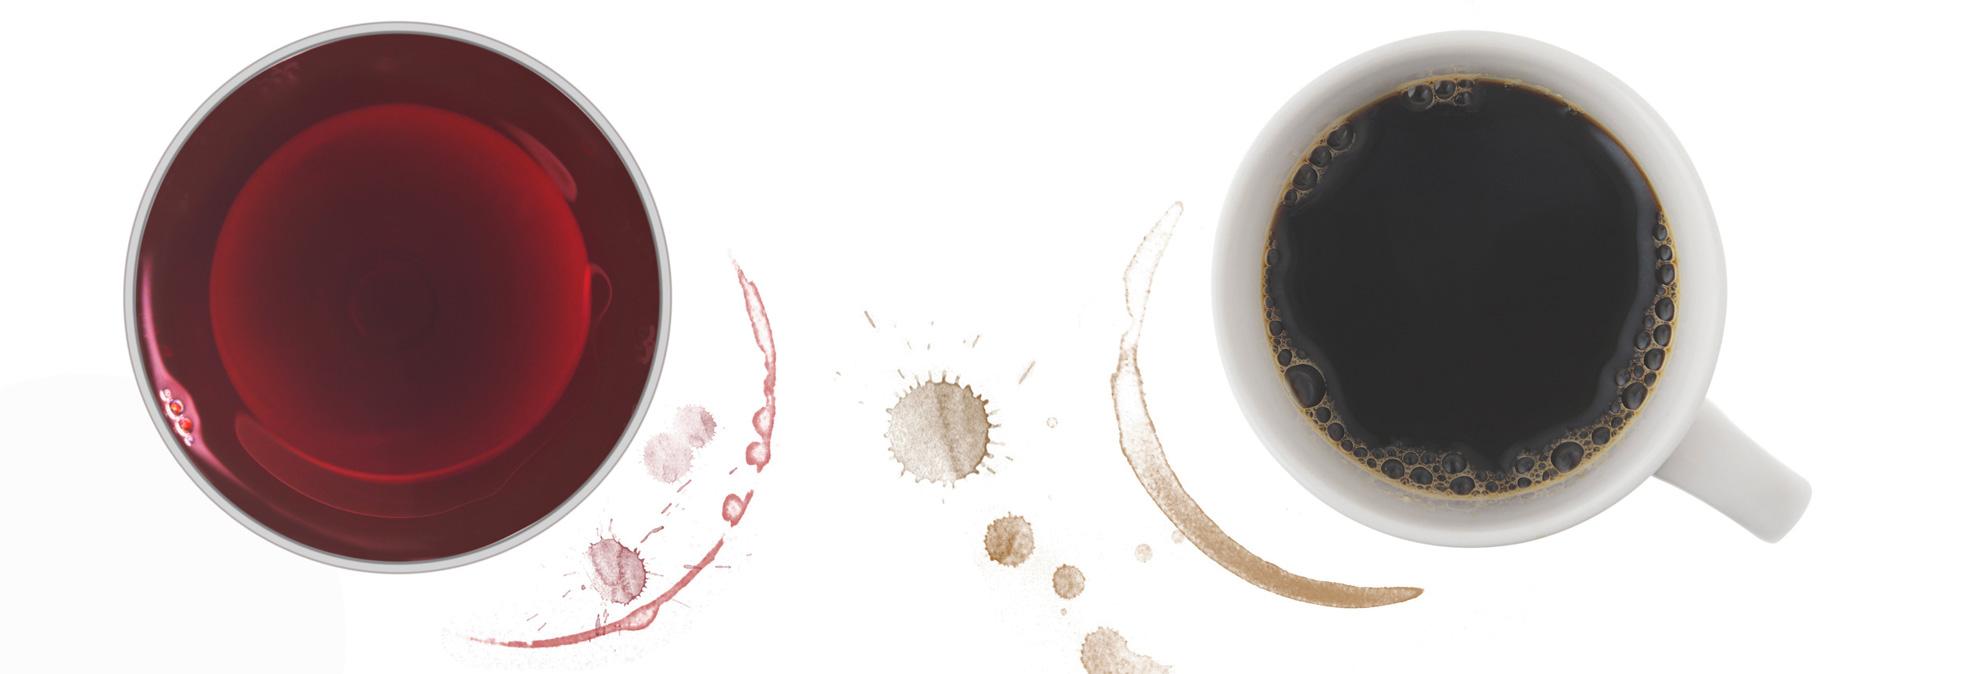 Health Benefits of Coffee and Wine